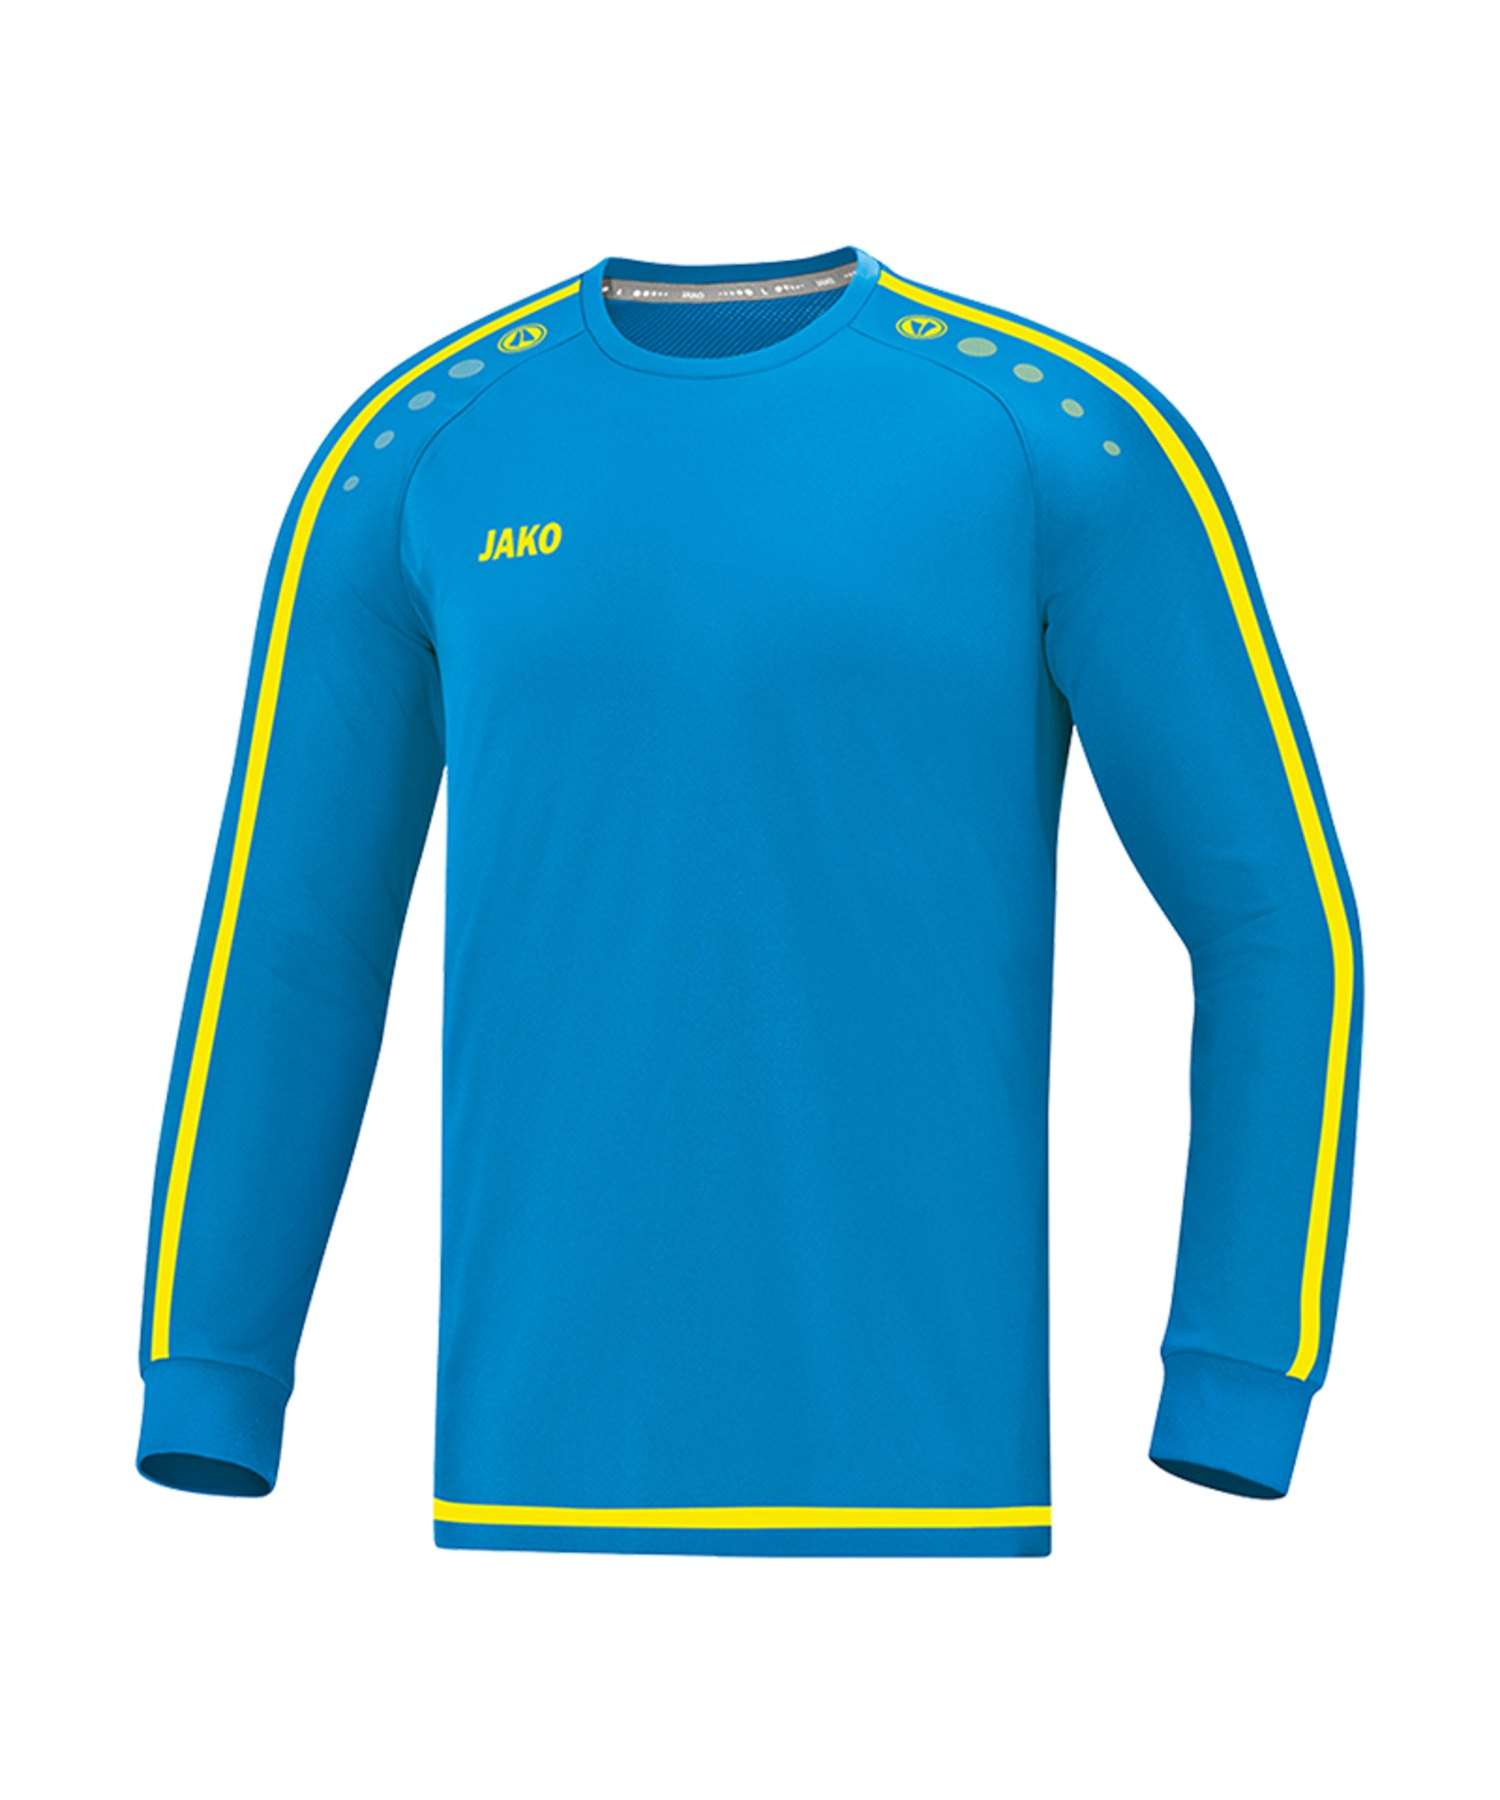 Jako Striker 2.0 Trikot langarm Blau Gelb F89 - Blau